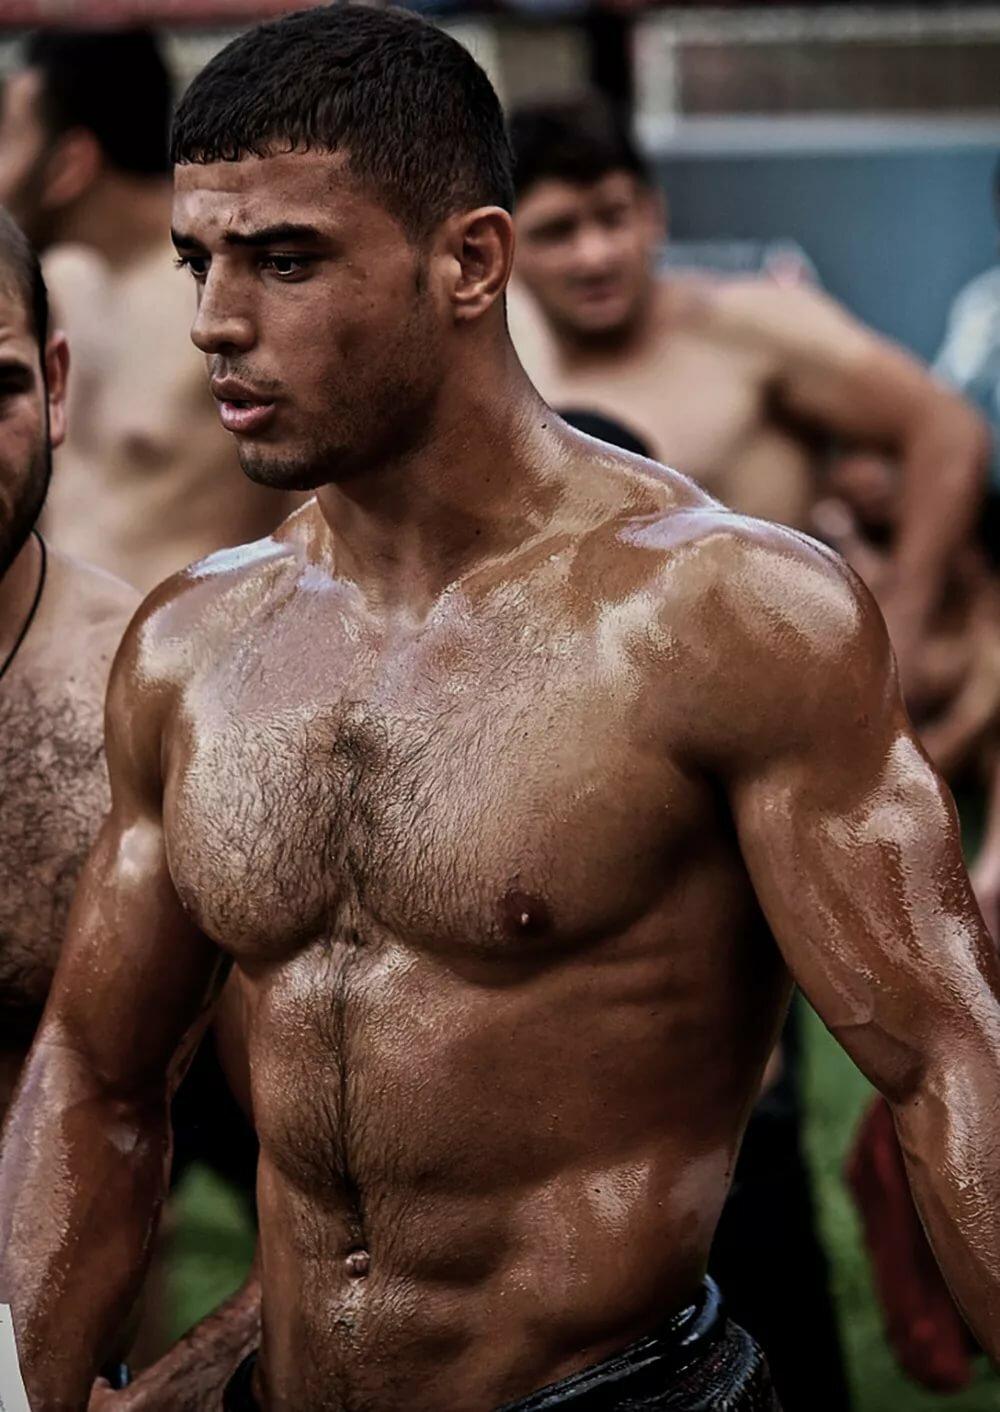 Nude Gay Wrestling